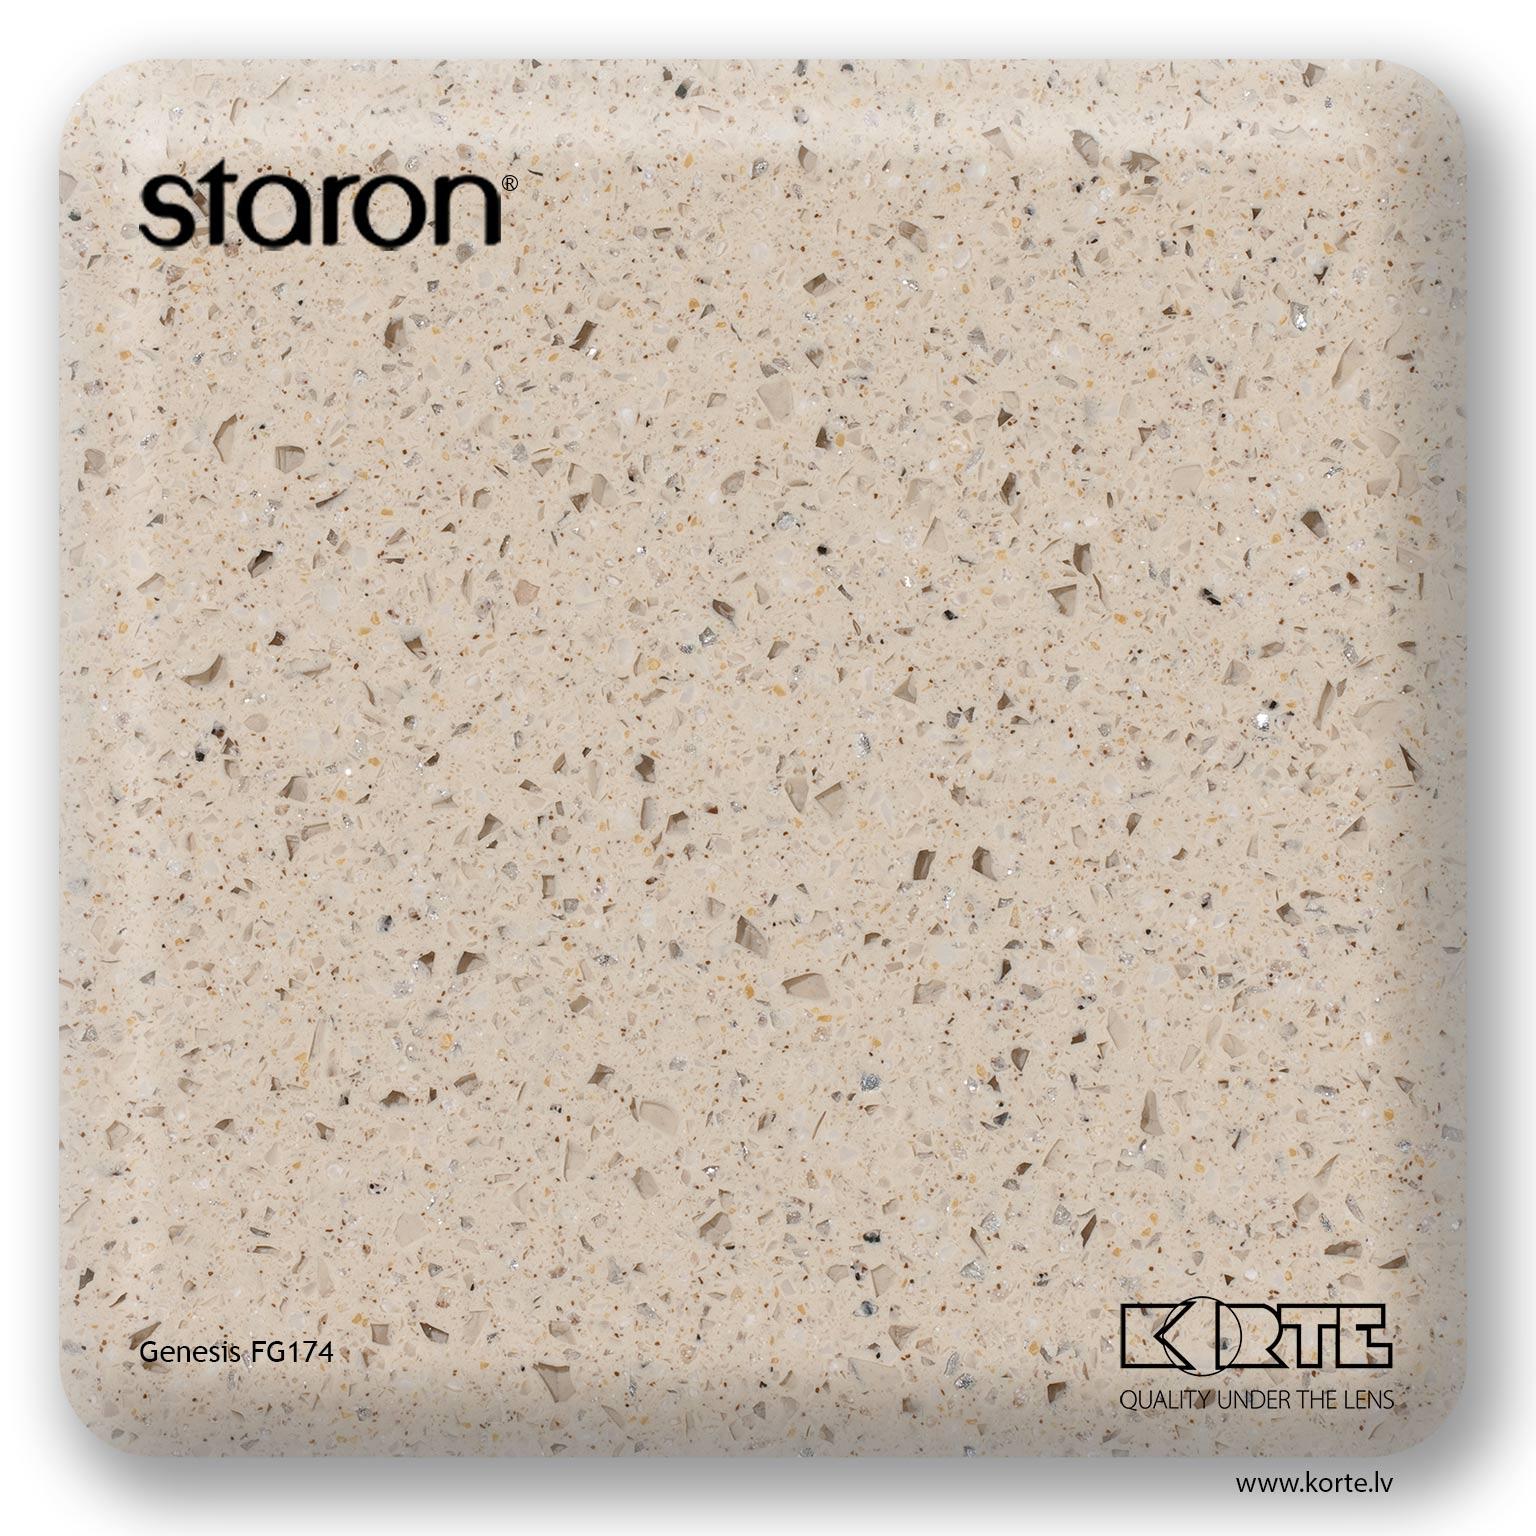 Staron Genesis FG174